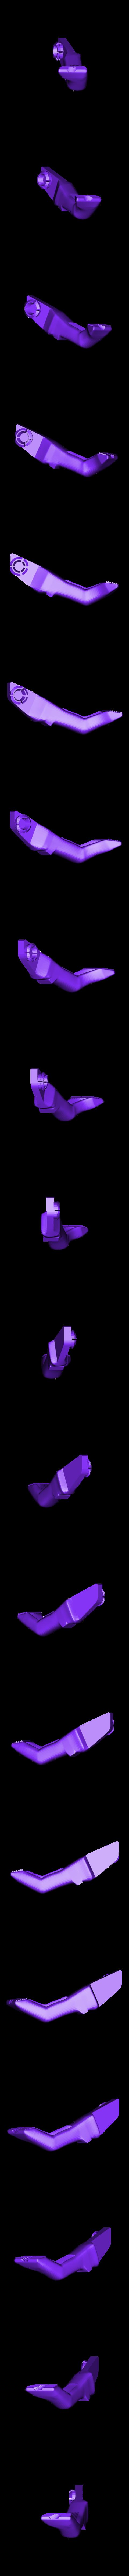 thumb4.stl Download free STL file Mechanical Prosthetic Concept Model • 3D printing design, boldmachines